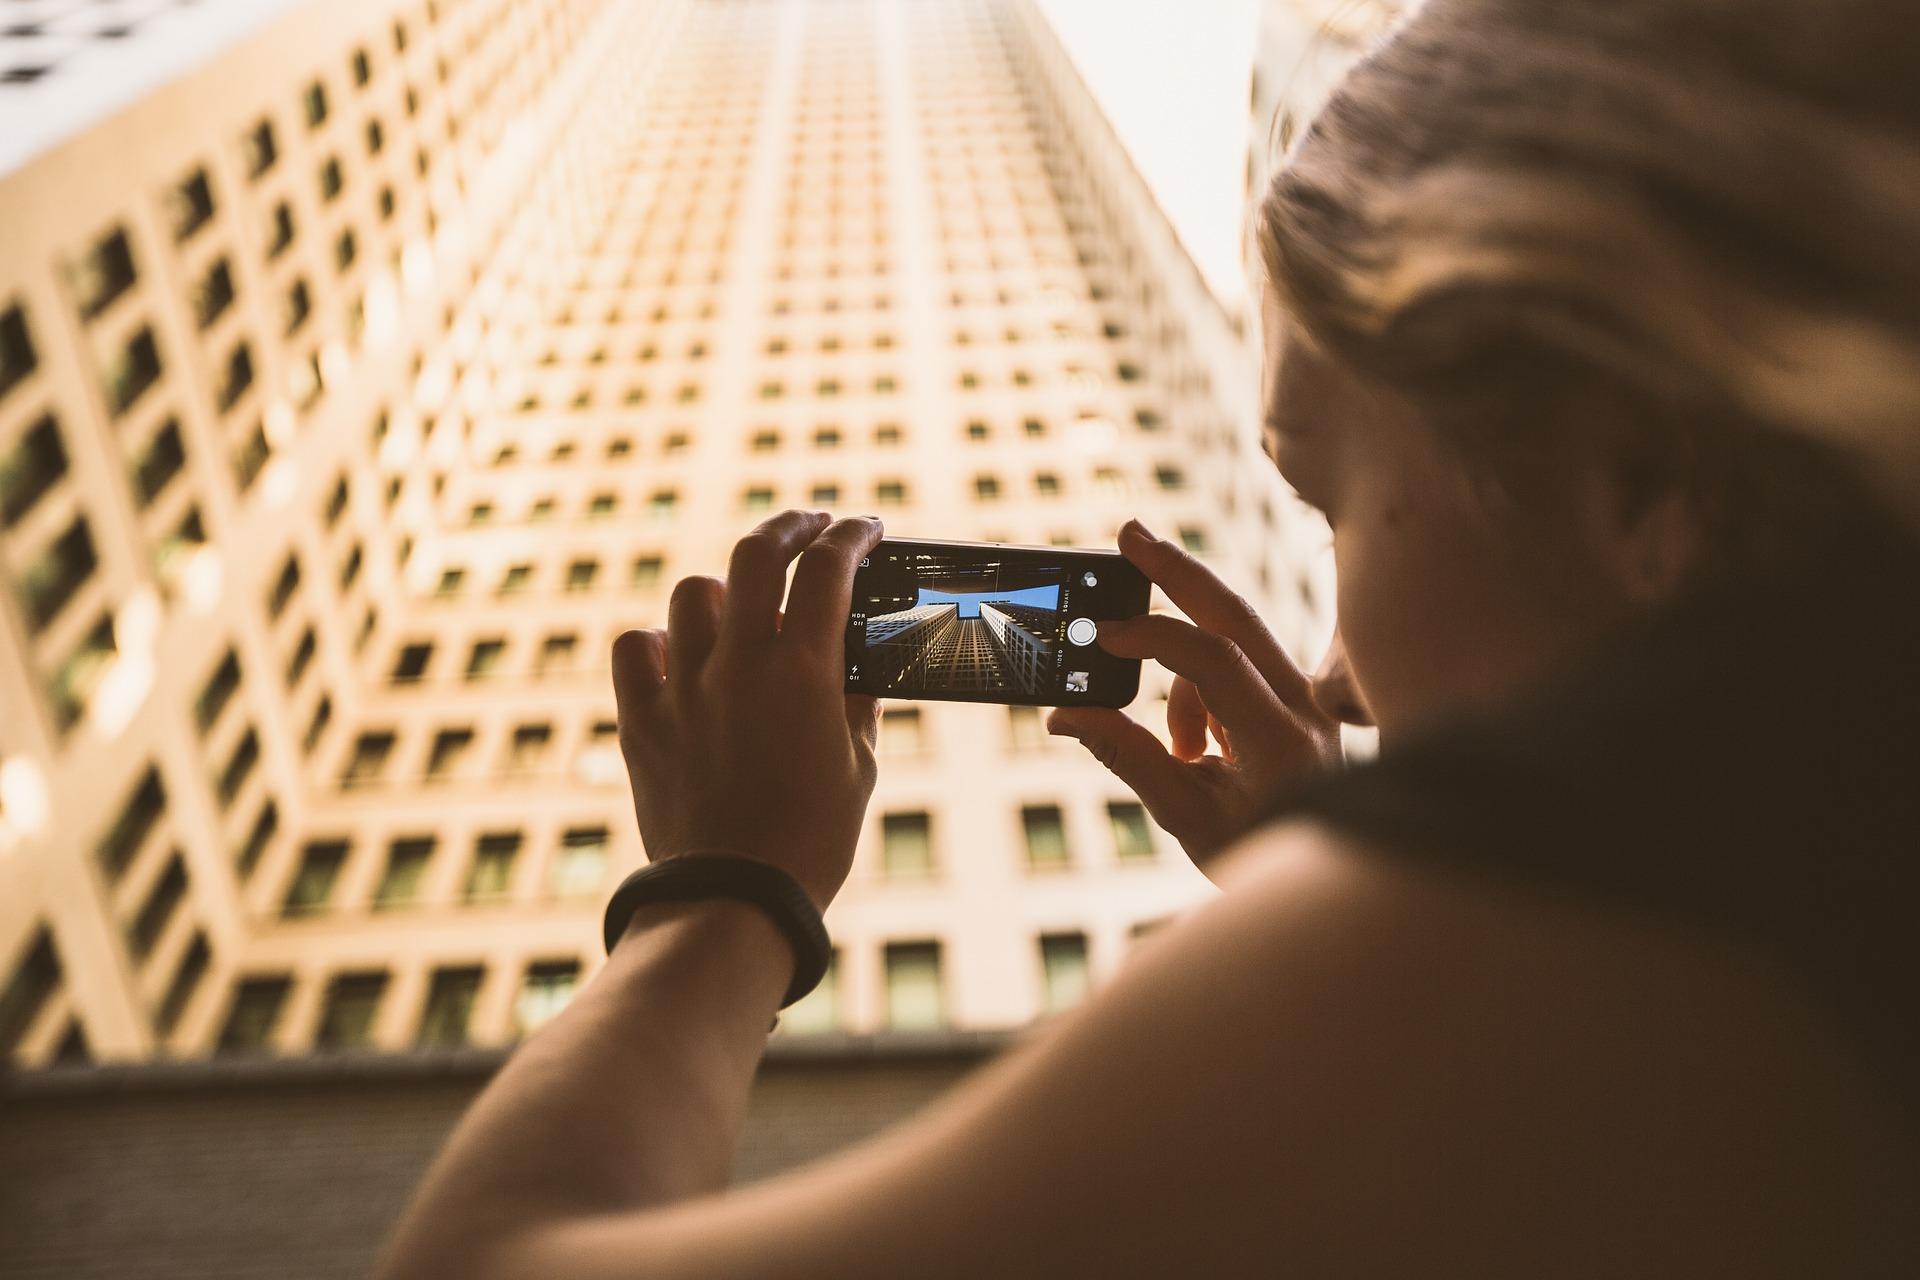 7 Aplikasi Yang Wajib Diinstal Agar Jualan Di Facebook Makin Lancar 5